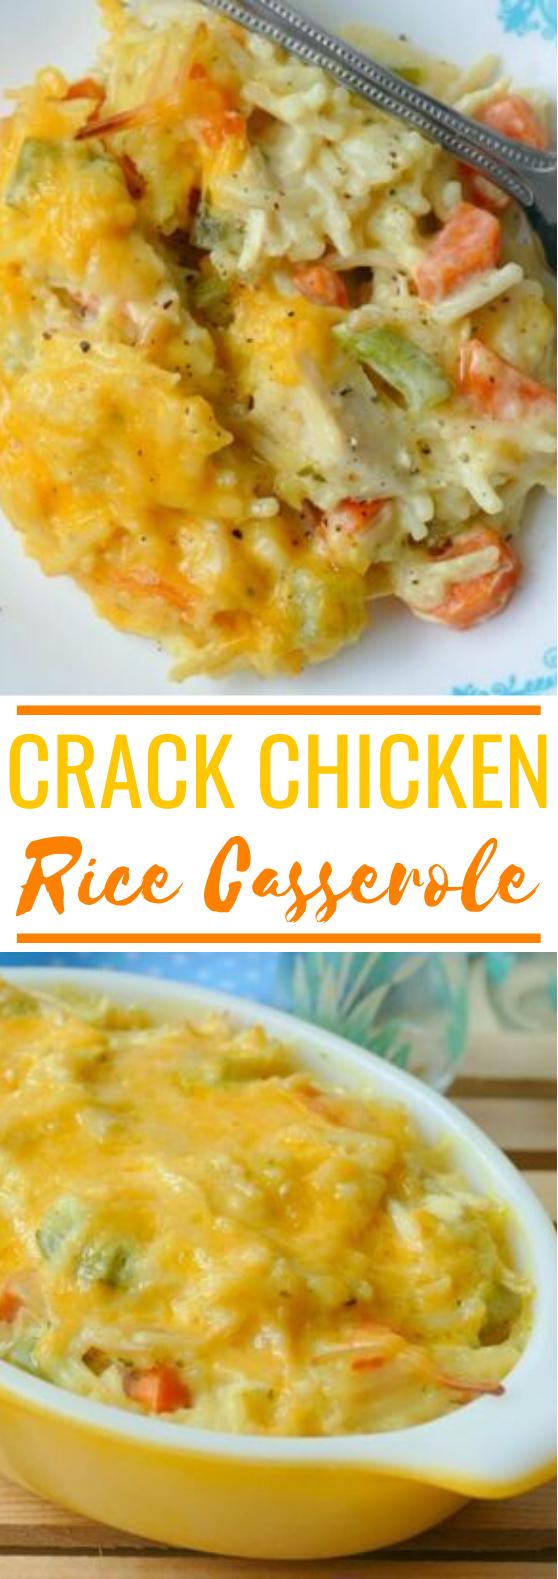 Crack Chicken and Rice Casserole #dinner #casserole #comfortfood #chicken #recipes